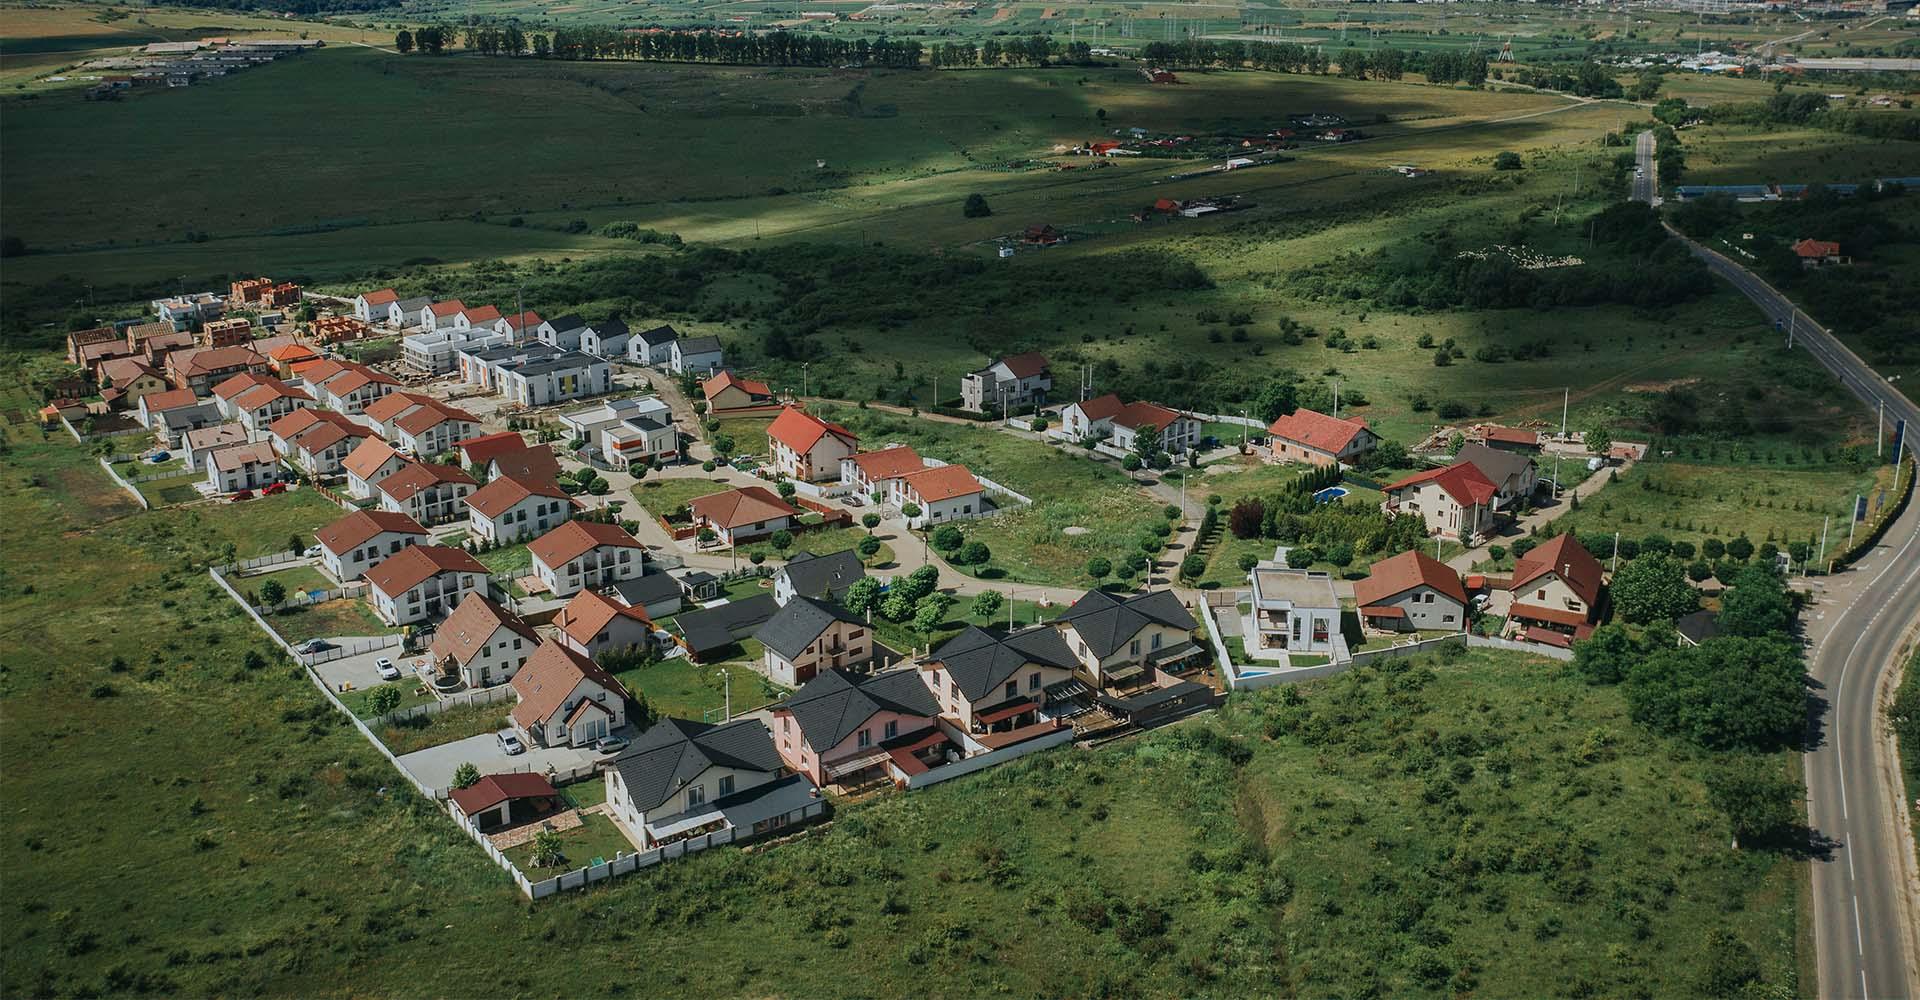 Bavaria Residential Park (über 100 Häuser)